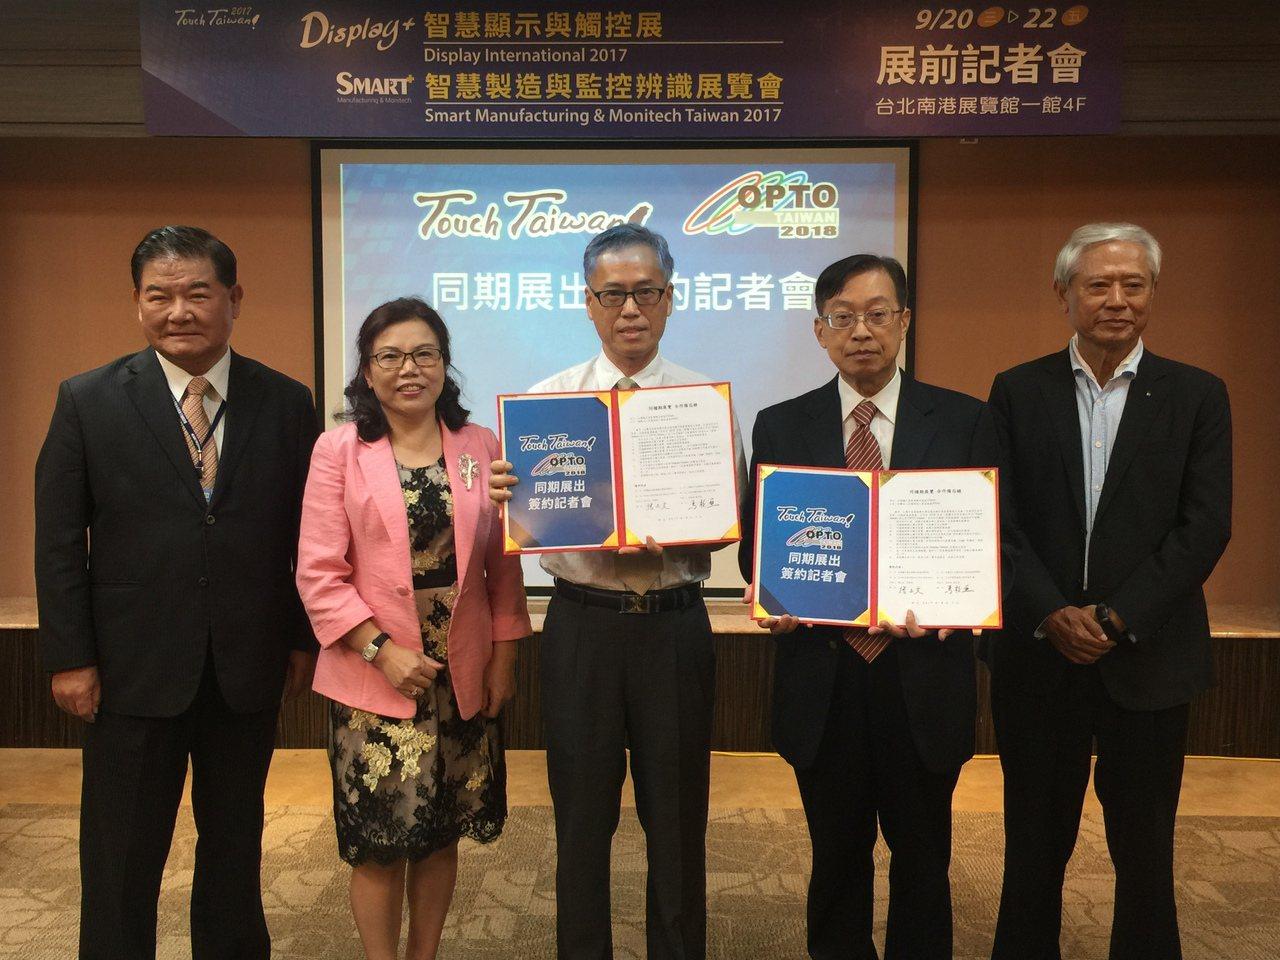 Touch Taiwan與OPTO Taiwan在2018年將聯合展出,圖為台灣...